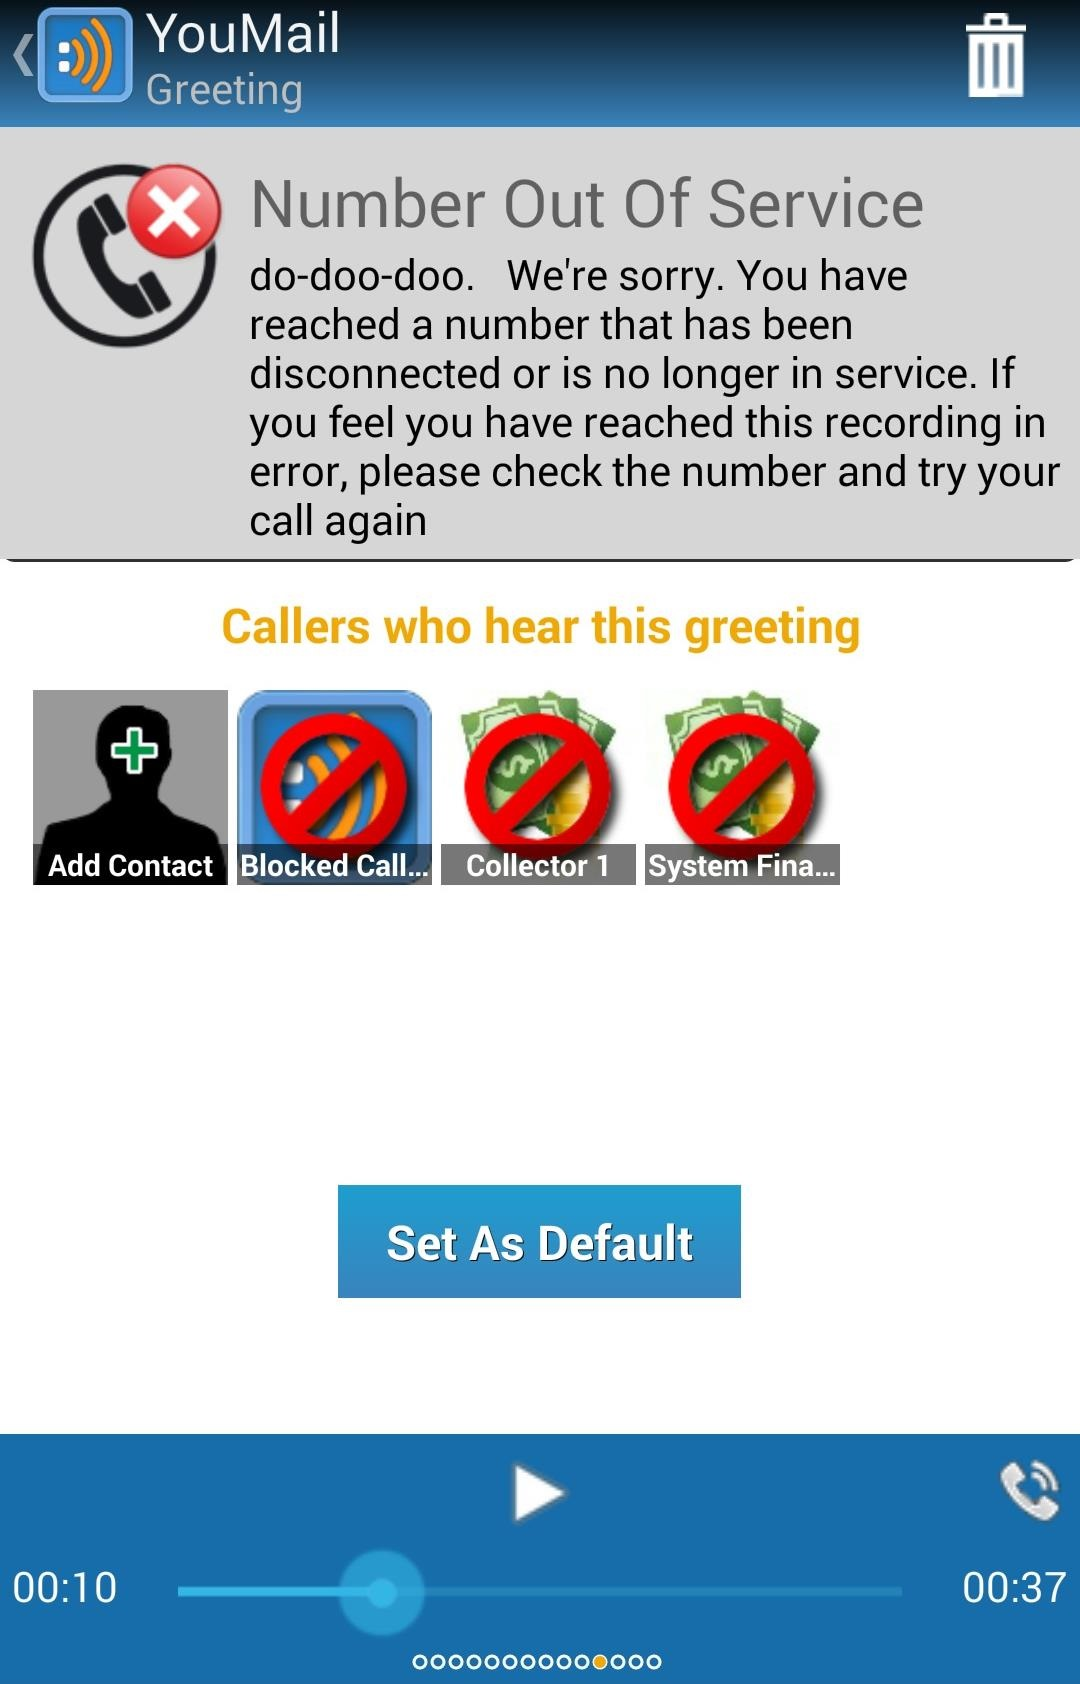 Create custom voicemail greetings for nexus 5 open mobile share 5 create custom voicemail greetings for nexus 5 kristyandbryce Choice Image